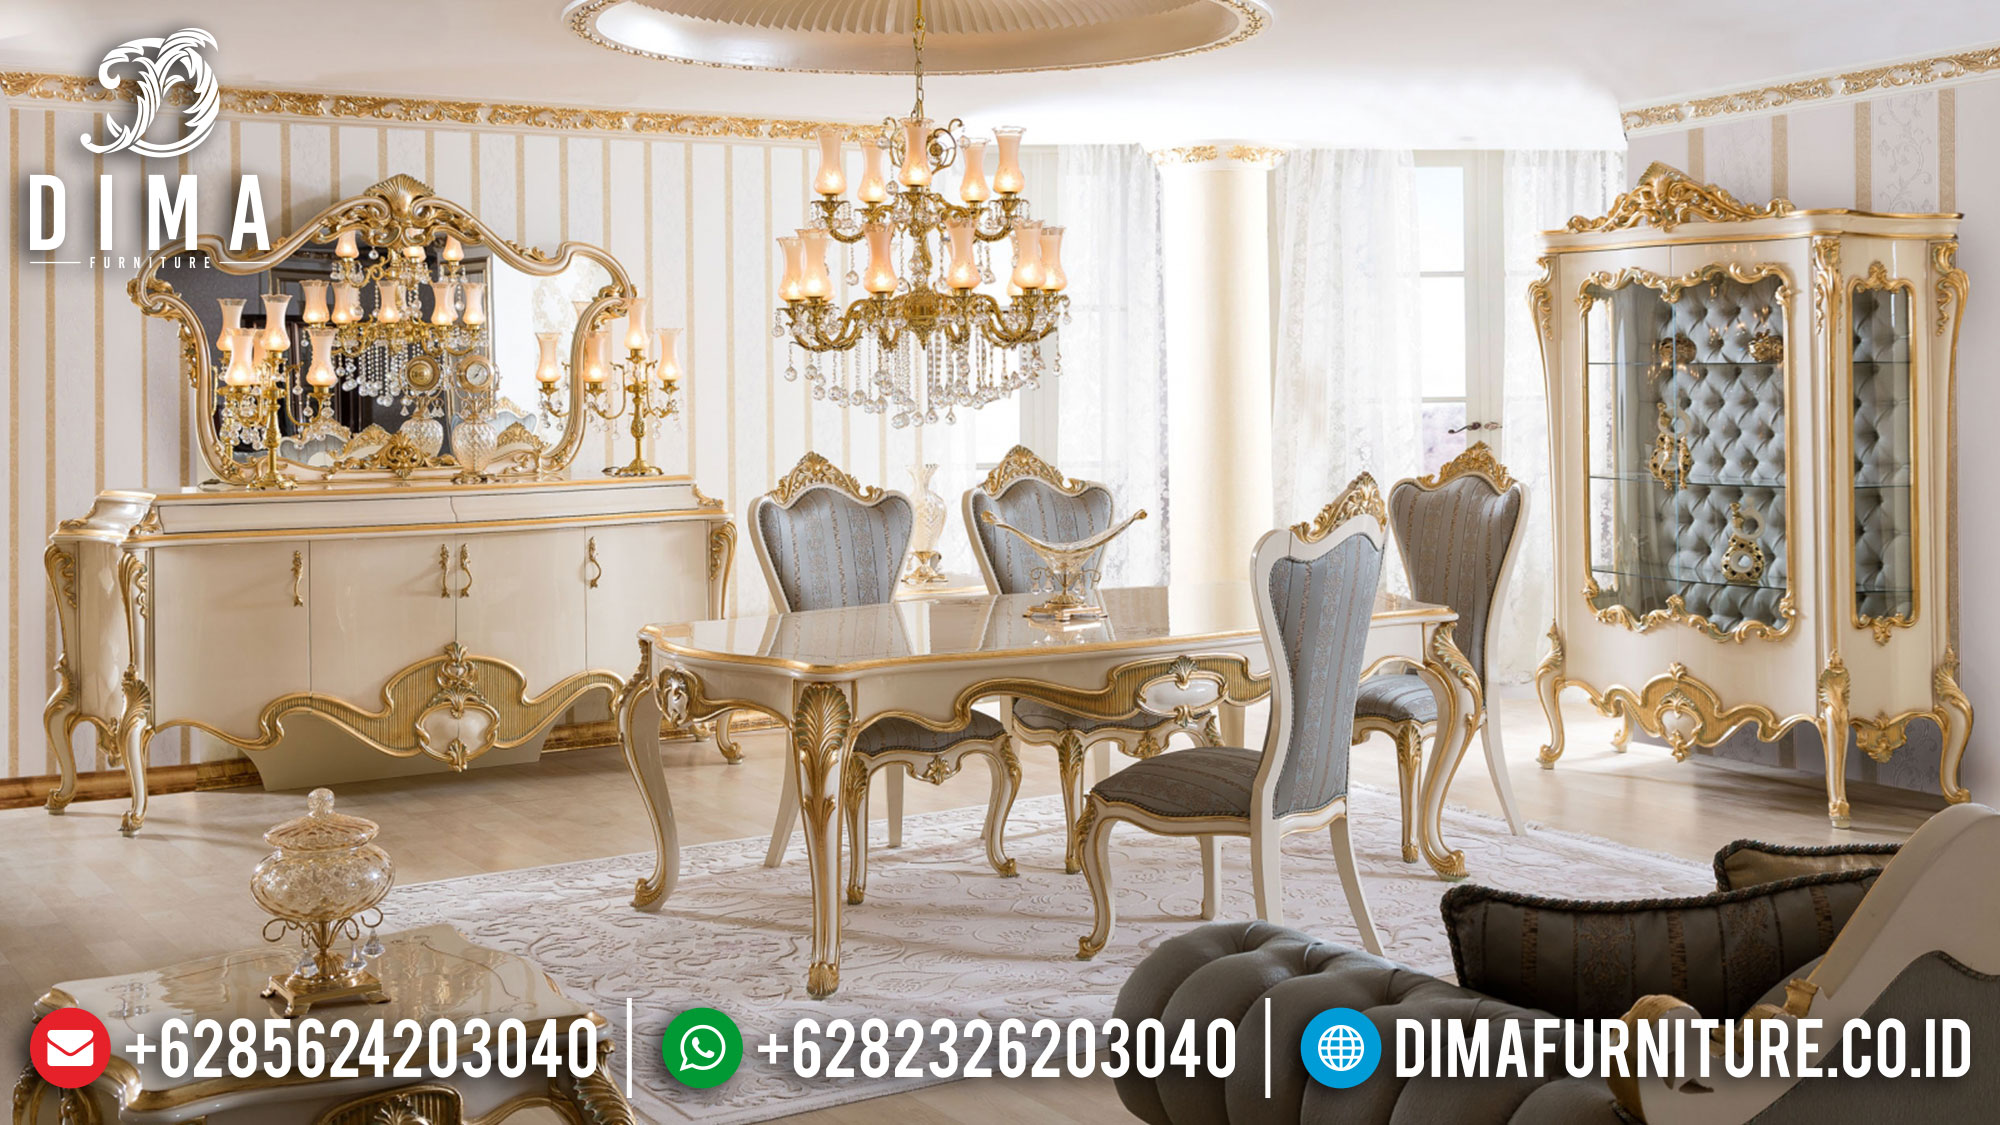 Buy Now Meja Makan Mewah Jepara Luxury Classic Carving Terbaru TTJ-1387